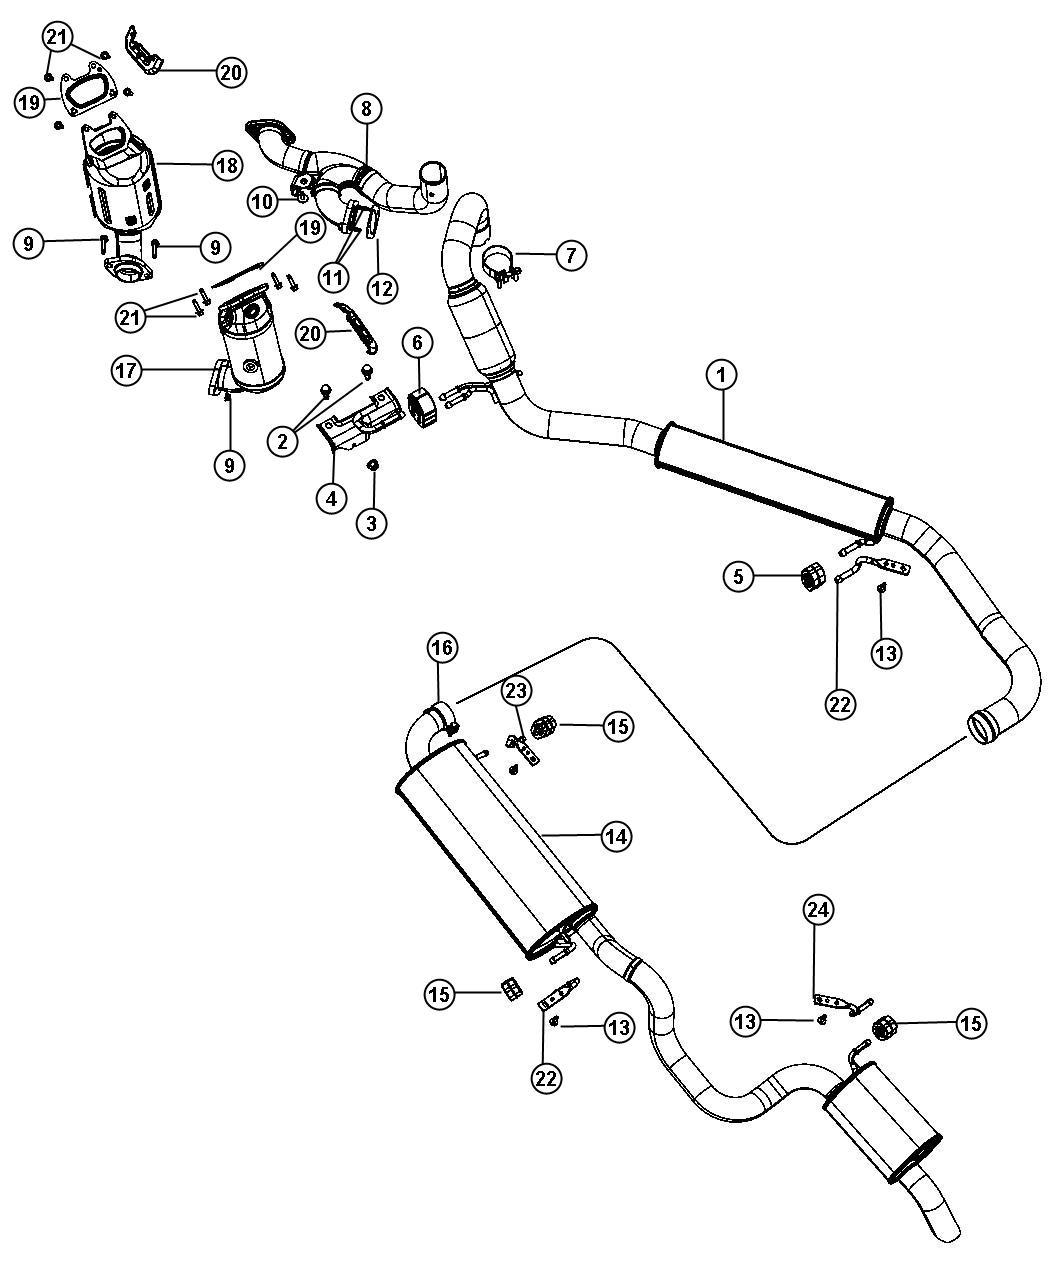 1996 Dodge Grand Caravan Engine Diagram FULL HD Quality